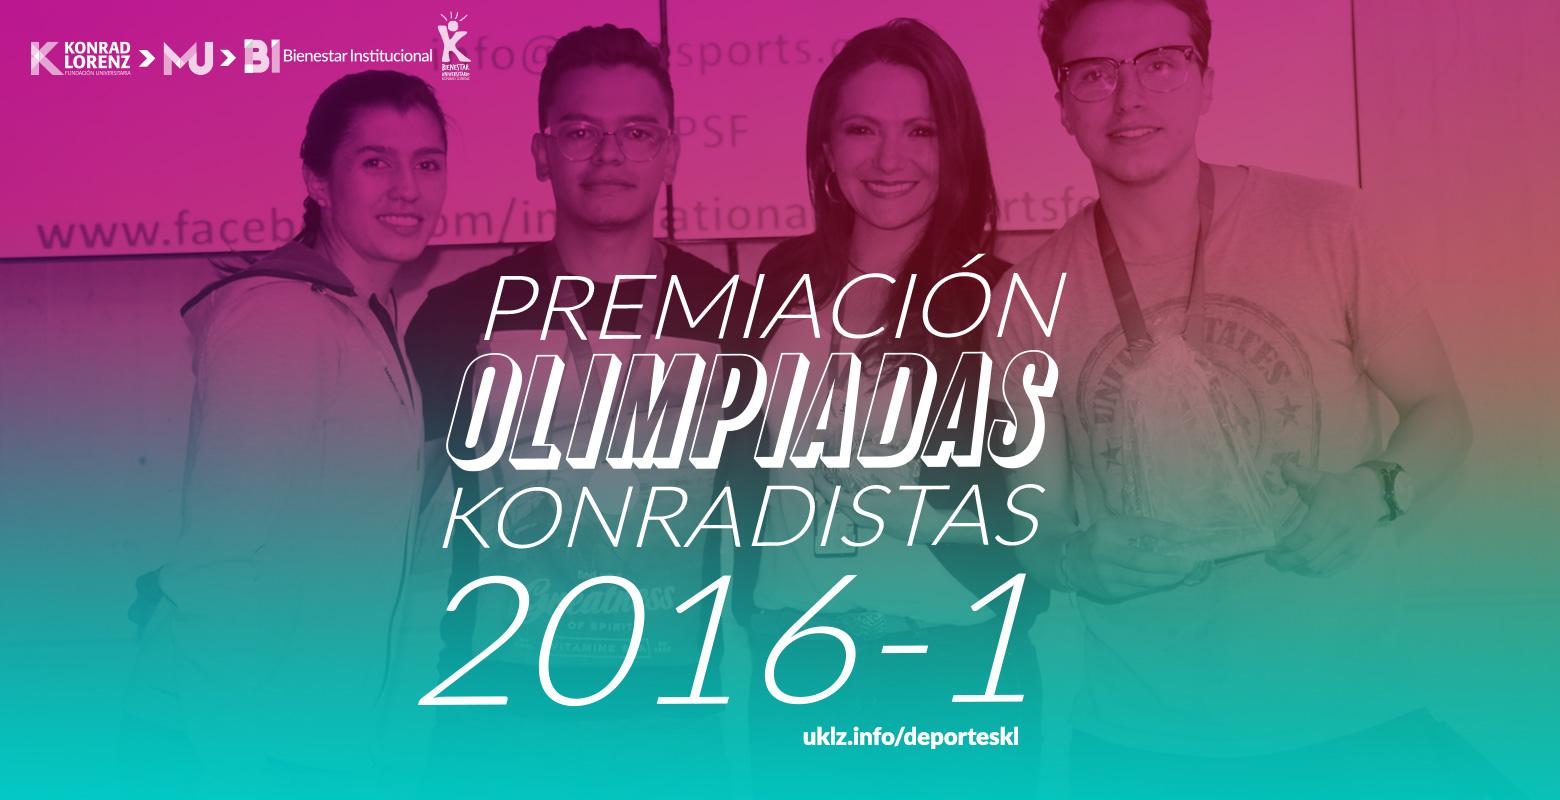 Premiación Olimpiadas Konradistas 2016-1